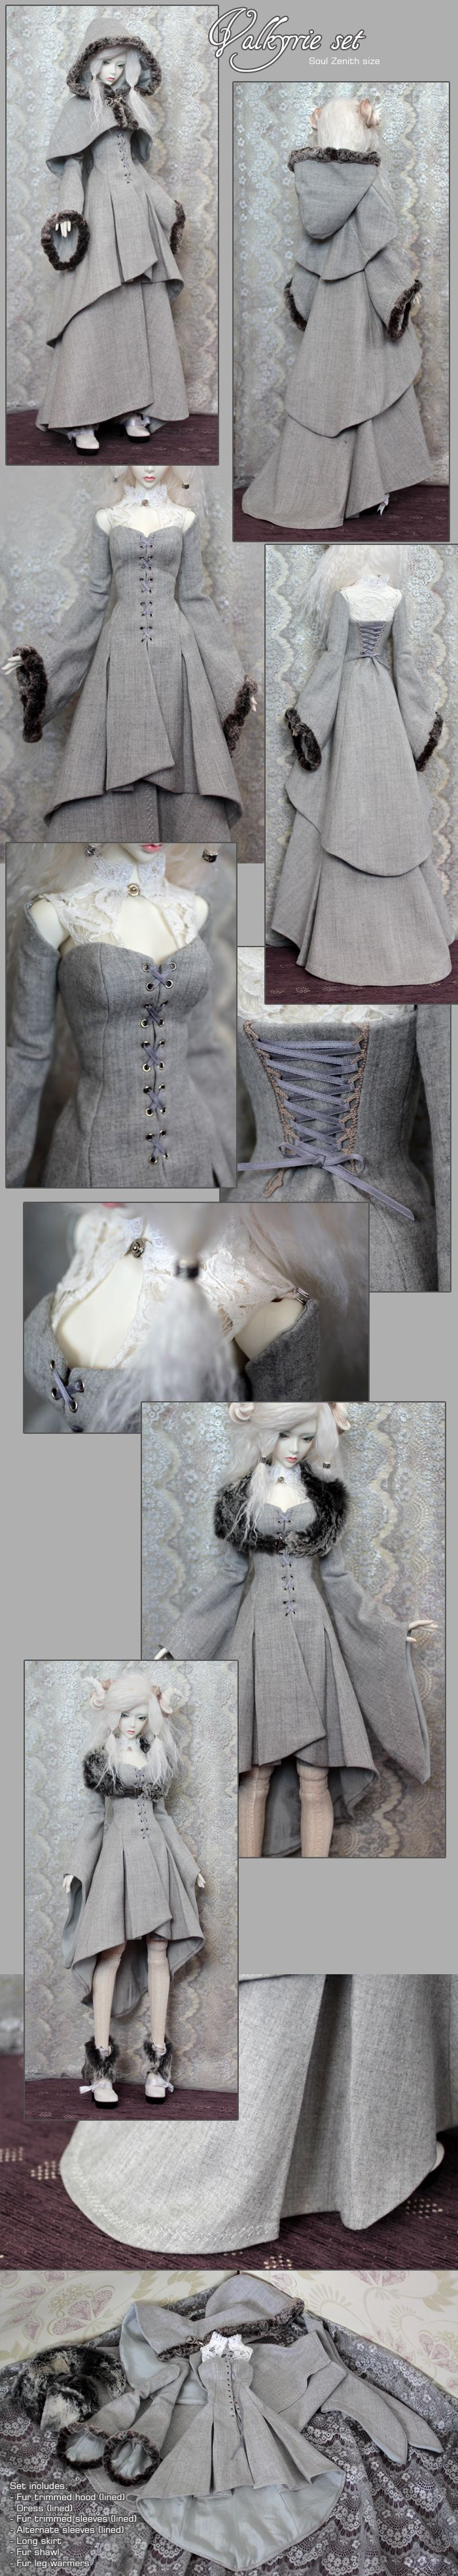 Sigrun's Valkyrie Set by *yenna-photo on deviantART